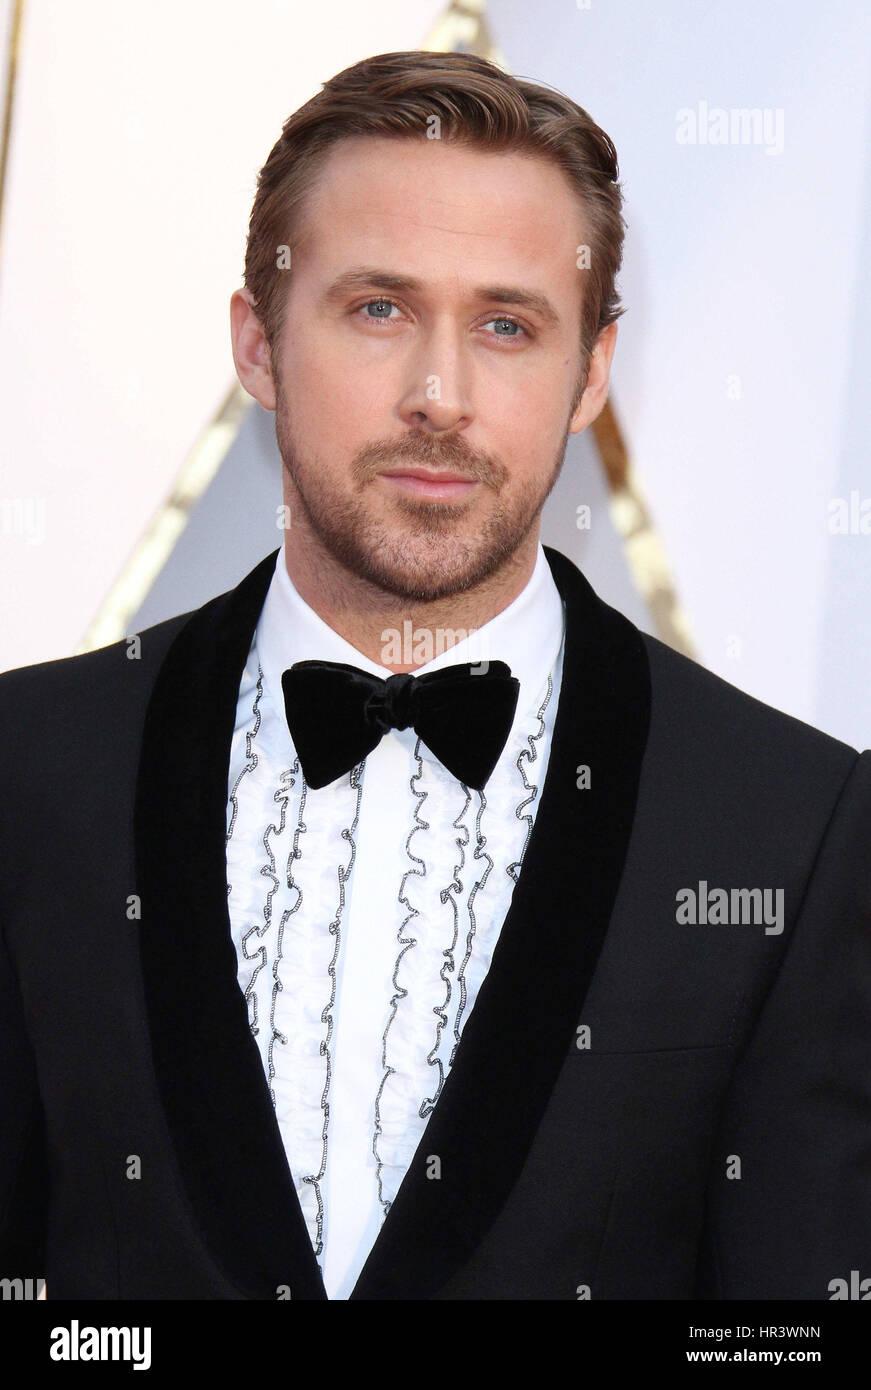 26 février 2017 - Hollywood, CA - Ryan Gosling. 89e Academy Awards annuels présentés par l'Academy Photo Stock